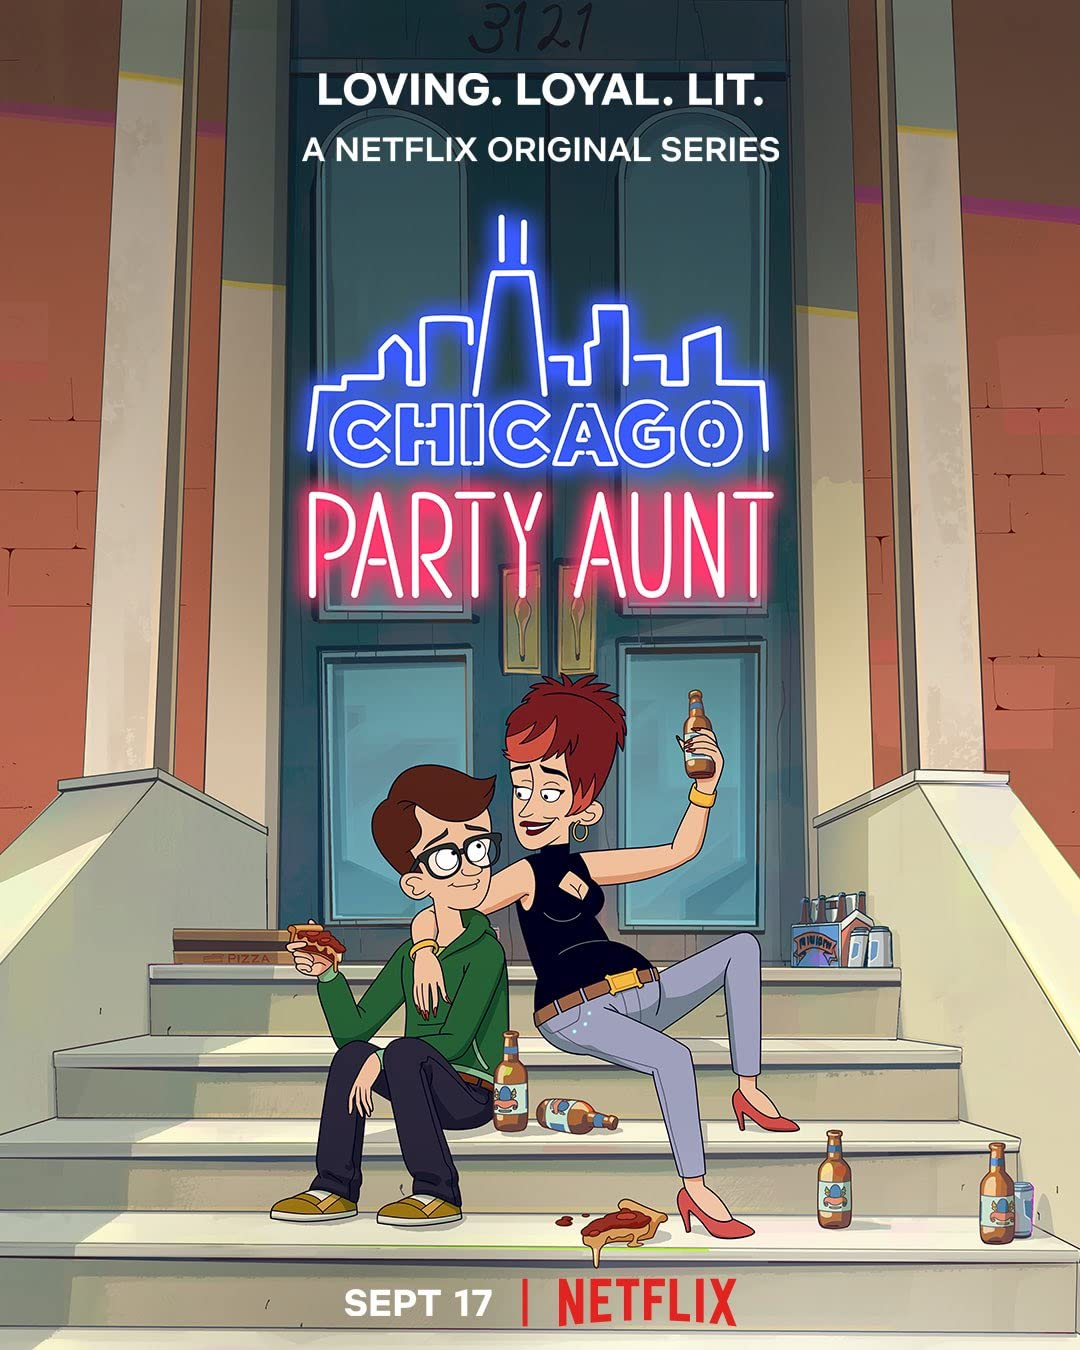 Chicago Party Aunt (2021) Season 1 Hindi Dubbed (Netflix)